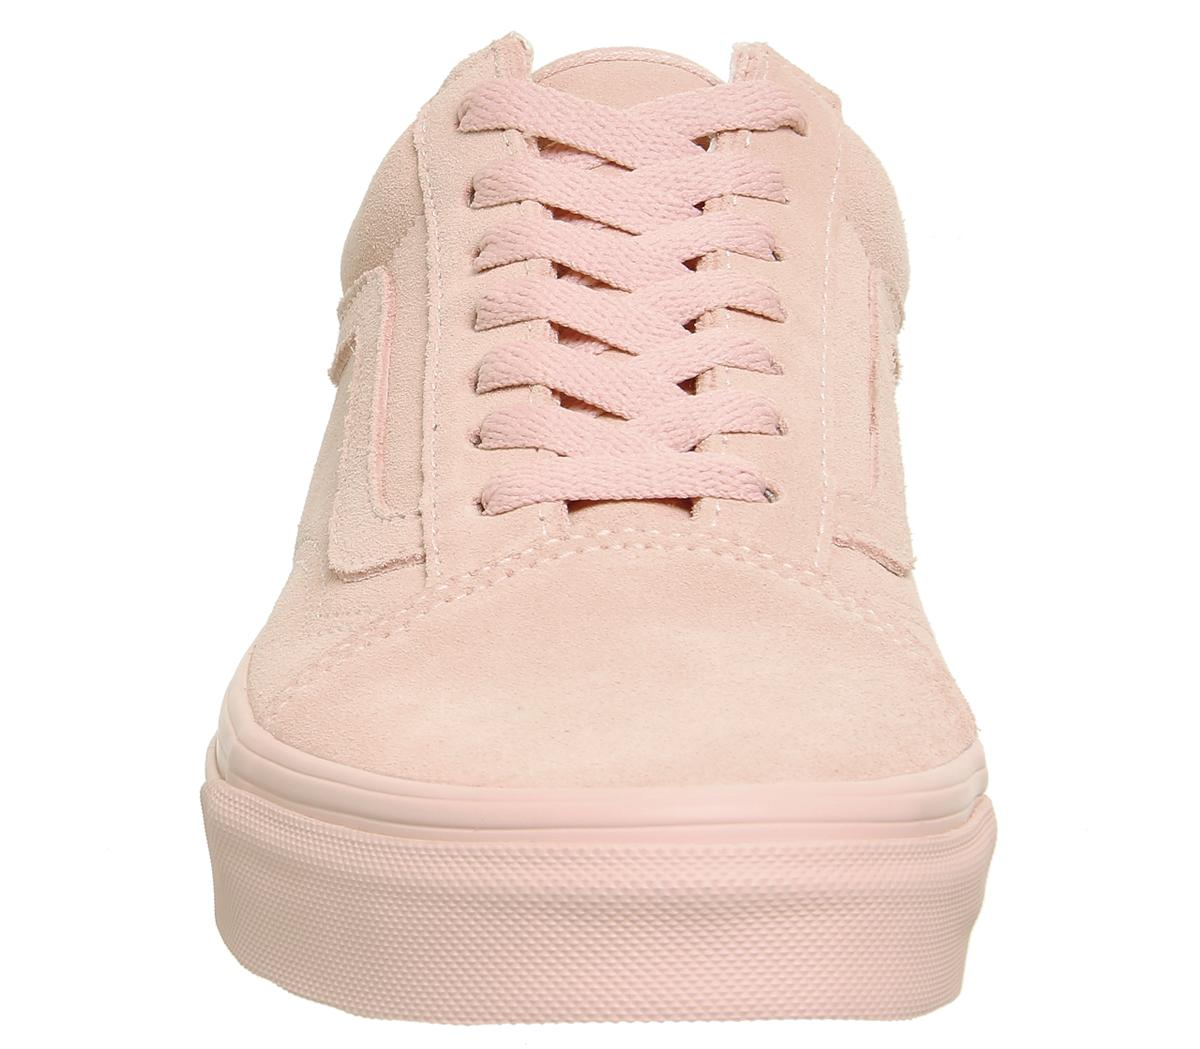 e39beeaa5e5933 Lyst - Vans Old Skool Trainers in Pink